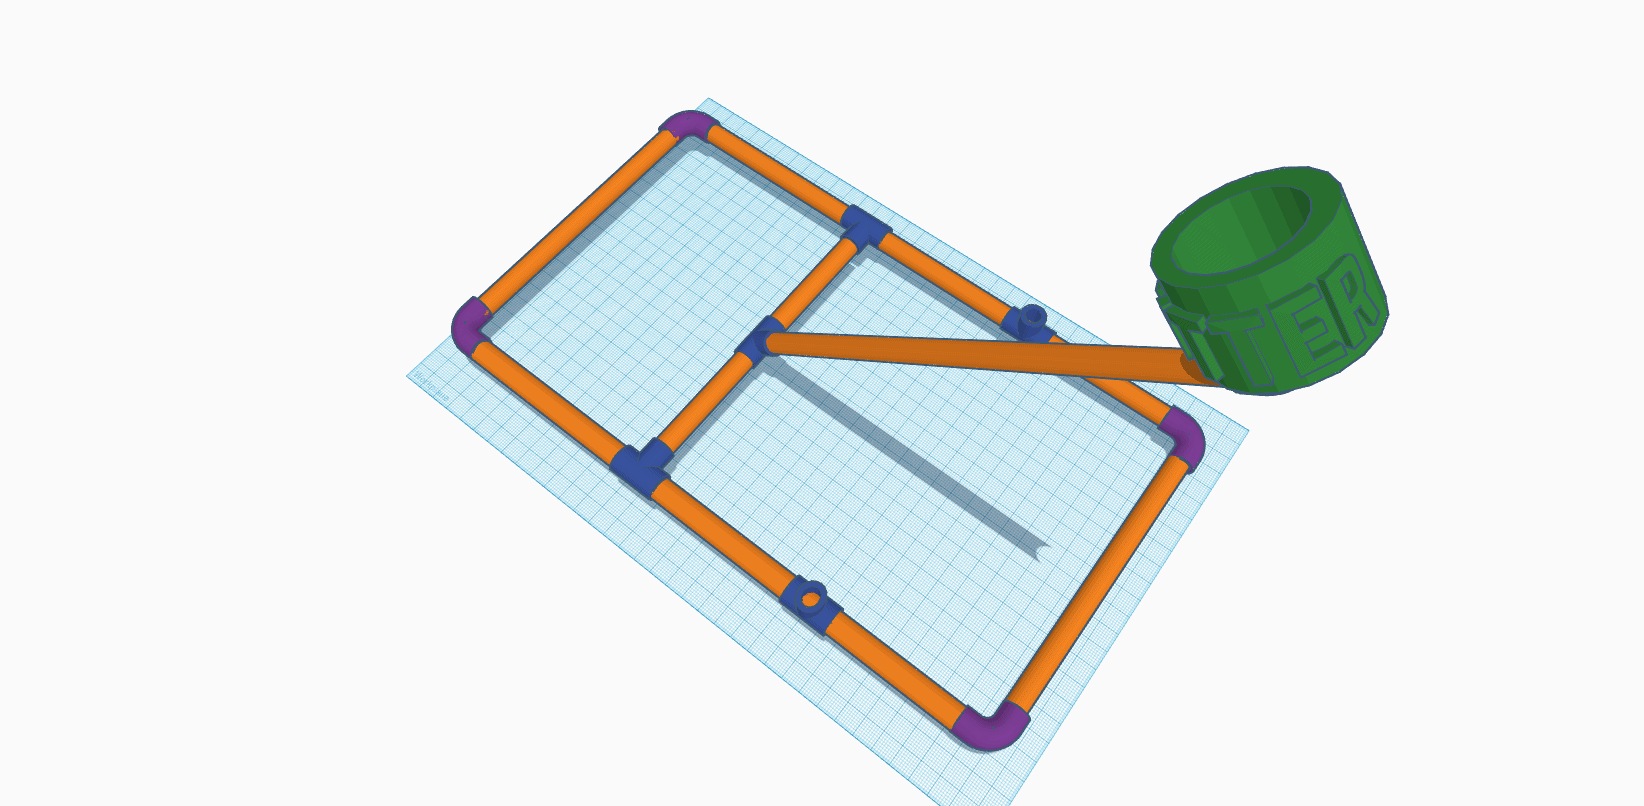 blueprint of pvc pipe catapult